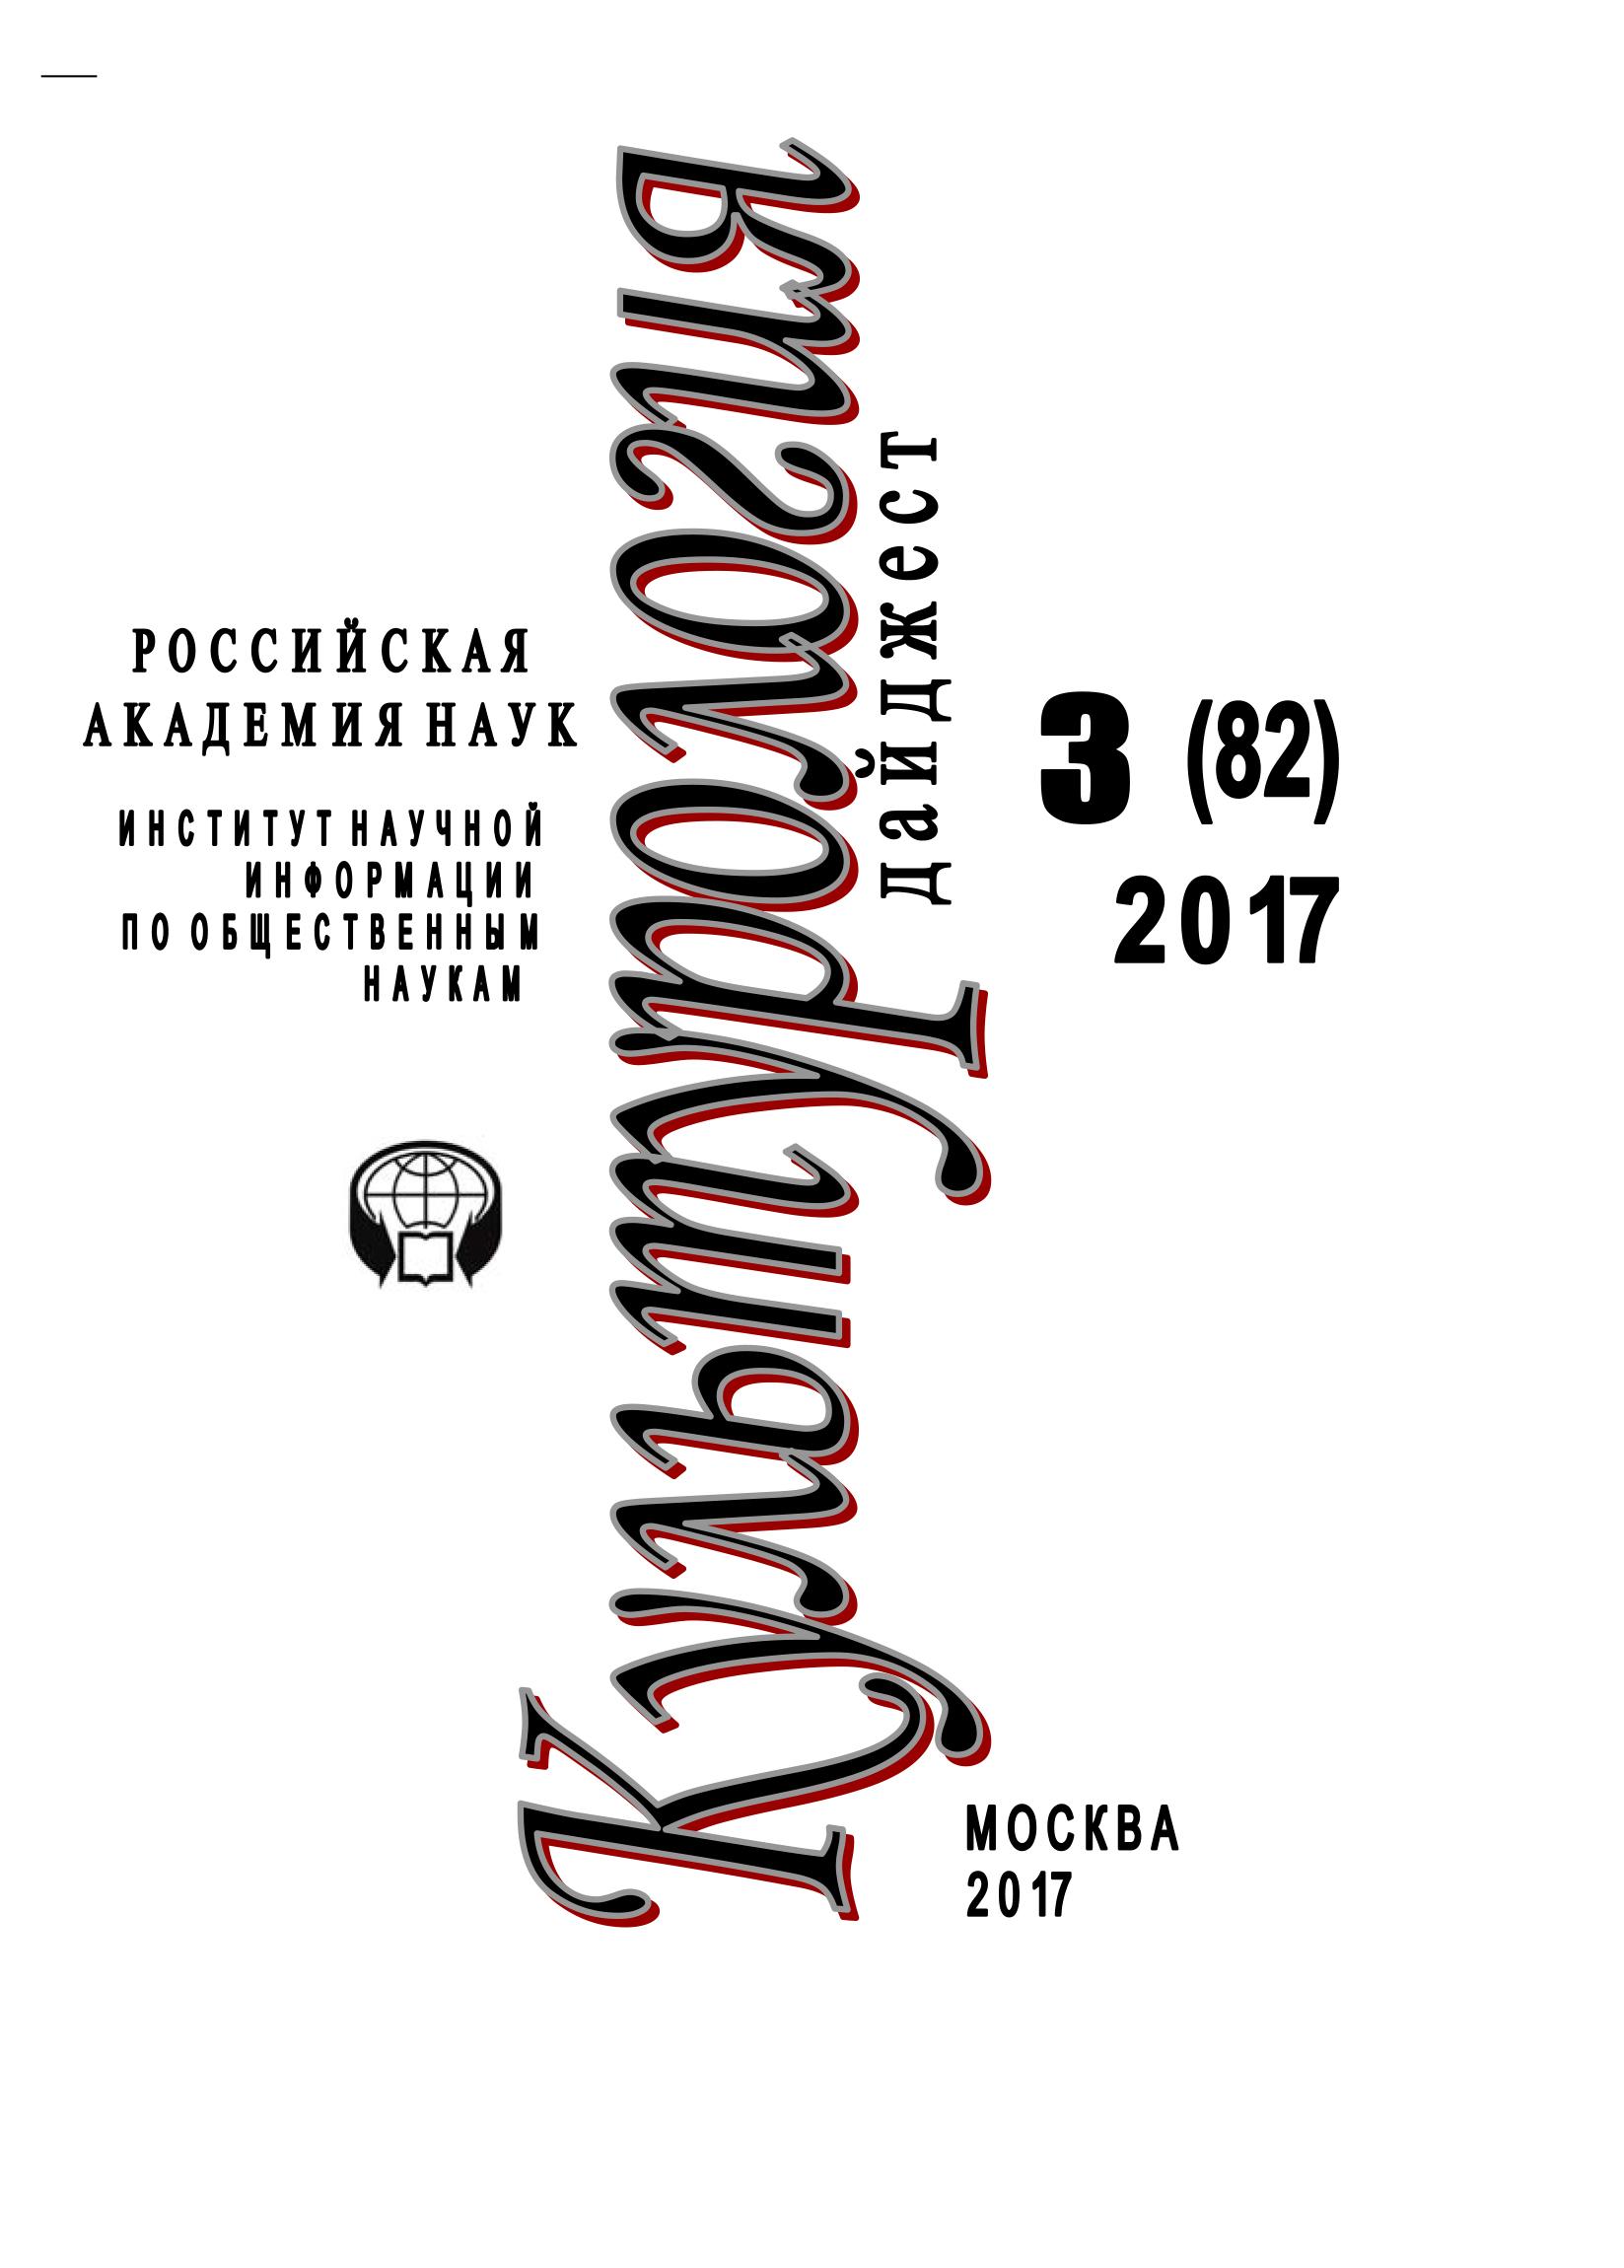 Ирина Галинская Культурология. Дайджест №3 / 2017 ирина галинская культурология дайджест 3 2015